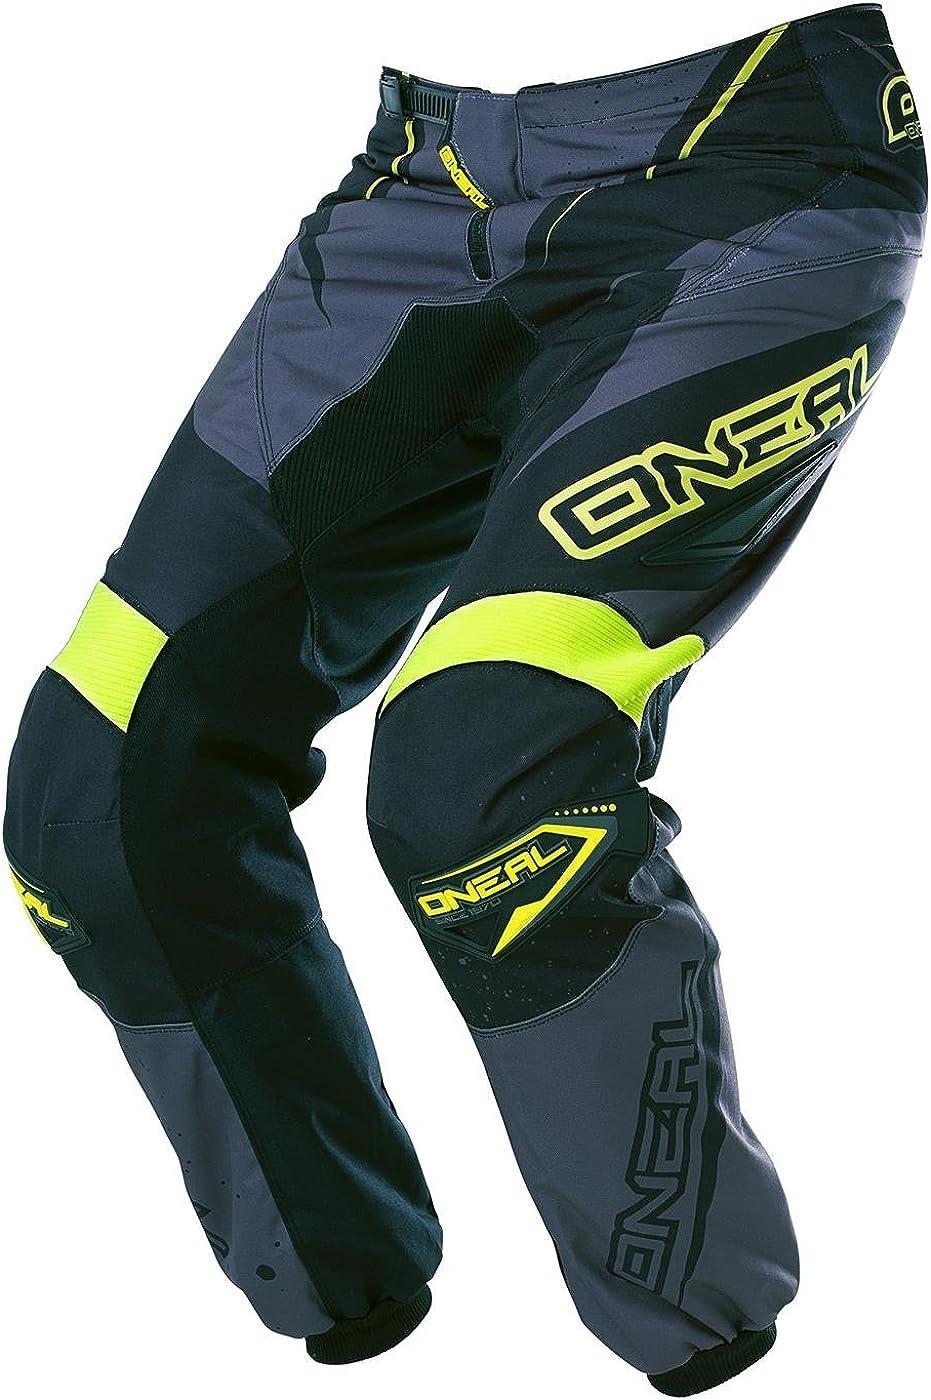 O Neal Herren Motocross Hose Element Racewear Grau 40 56 0128 2 Bekleidung